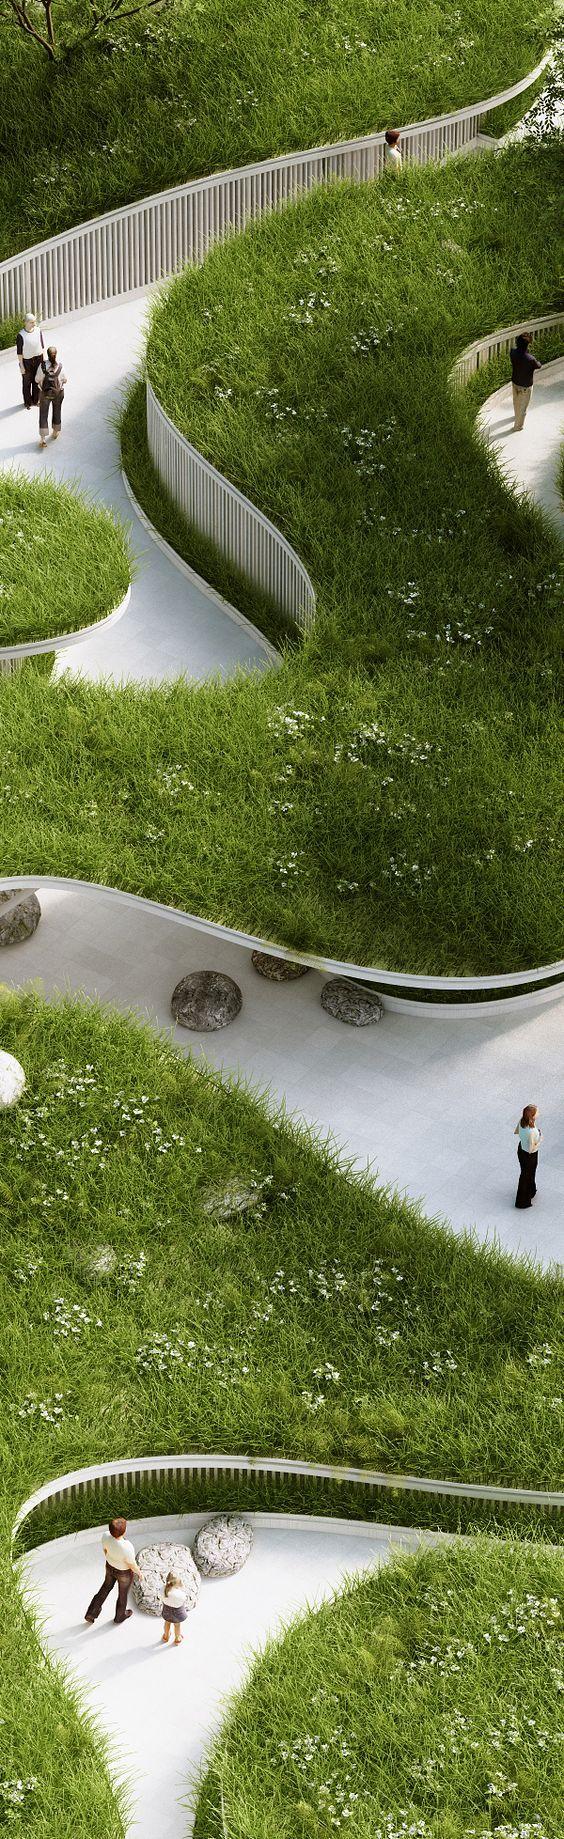 1000 Images About Urban Amp Public Design On Pinterest